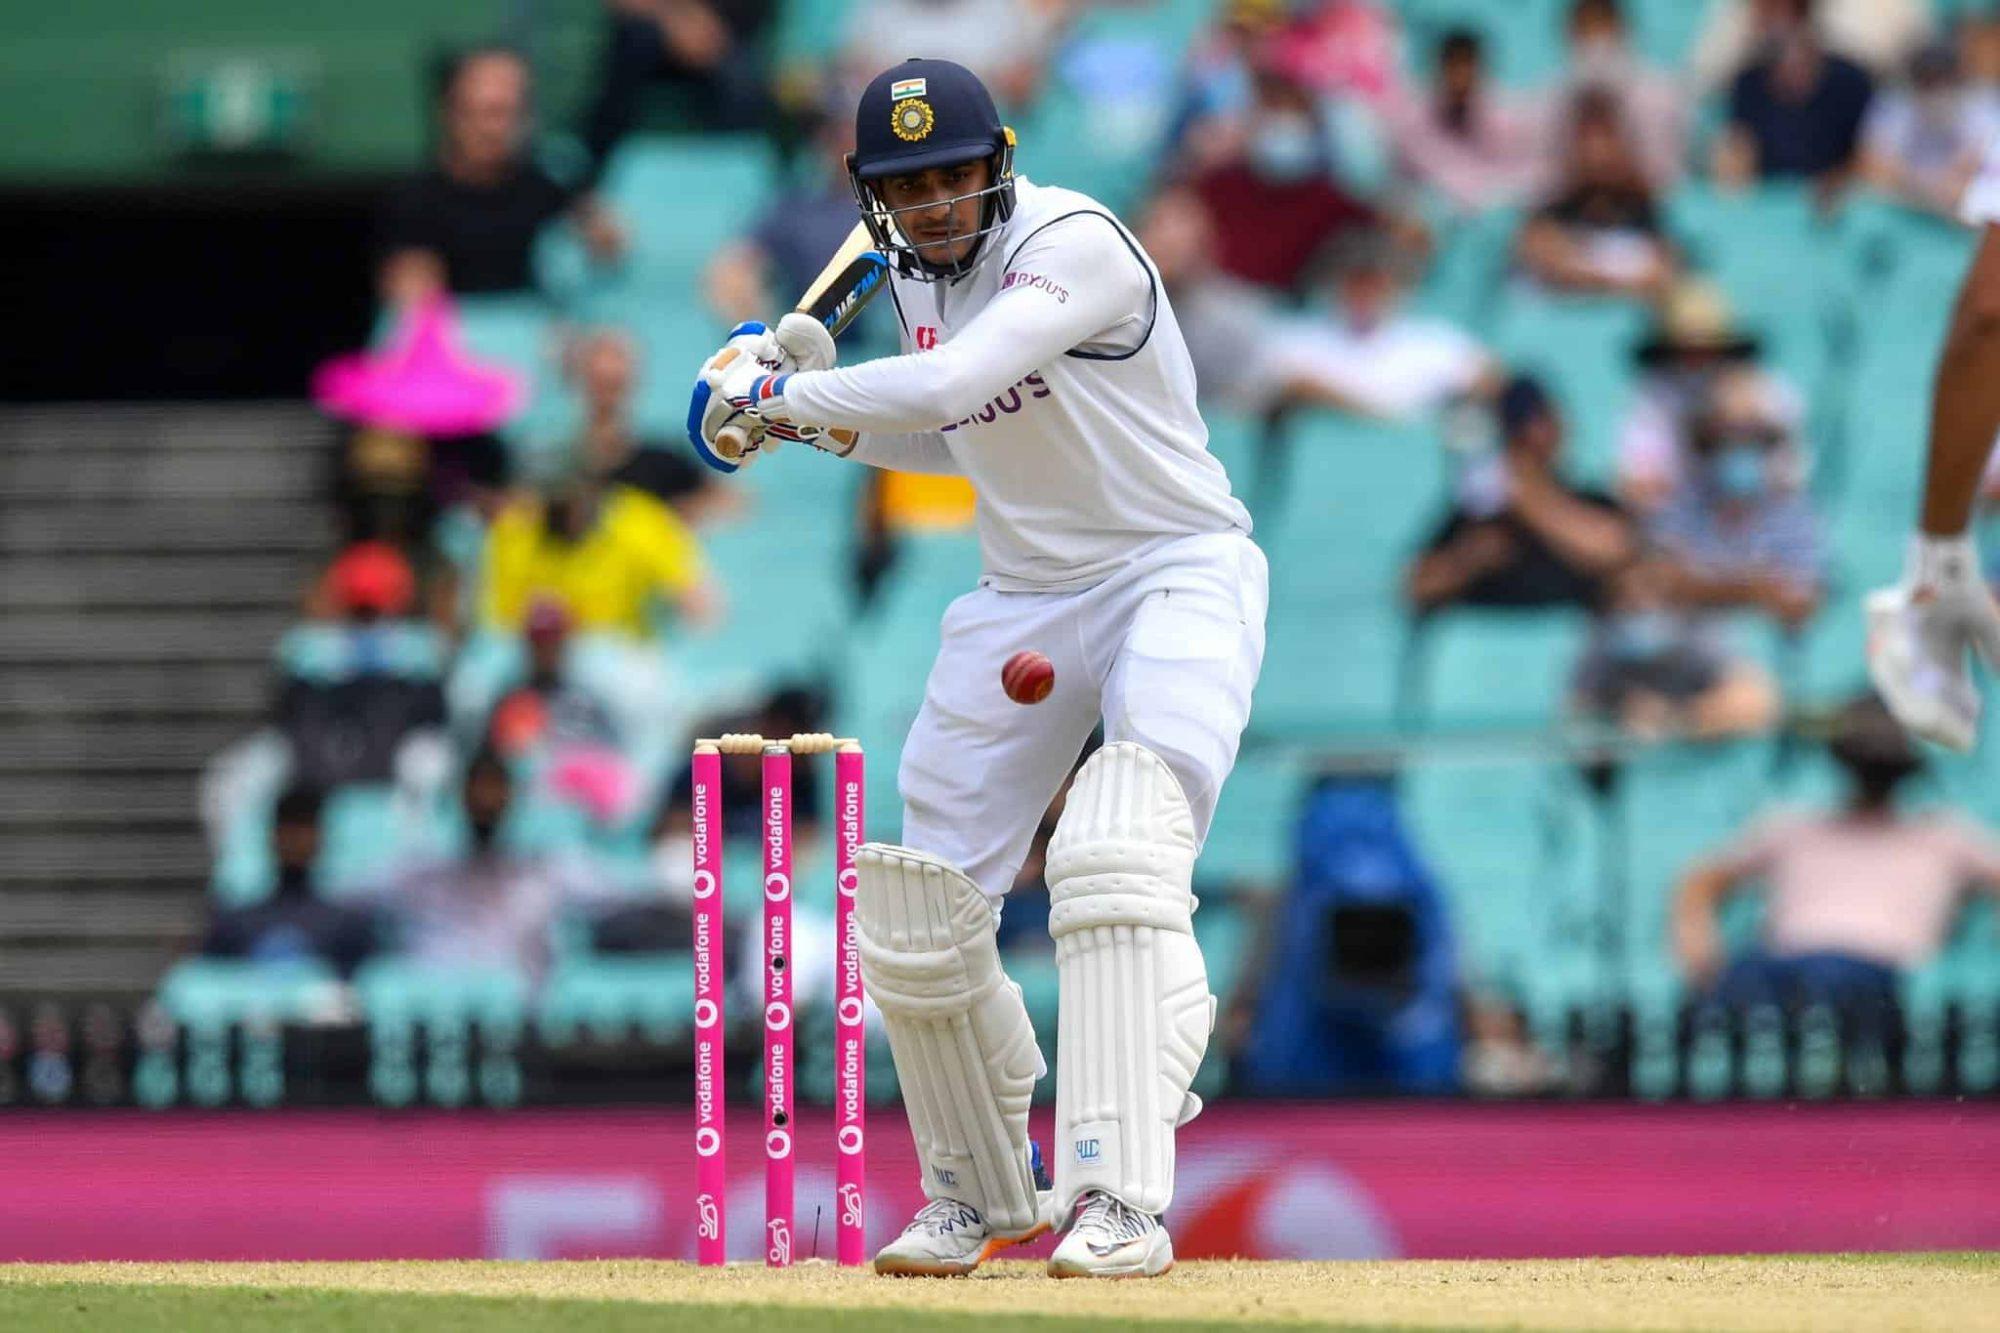 IND vs AUS: Ravindra Jadeja All Praises For Shubman Gill, Says 'Has Temperament to Play Long Innings'